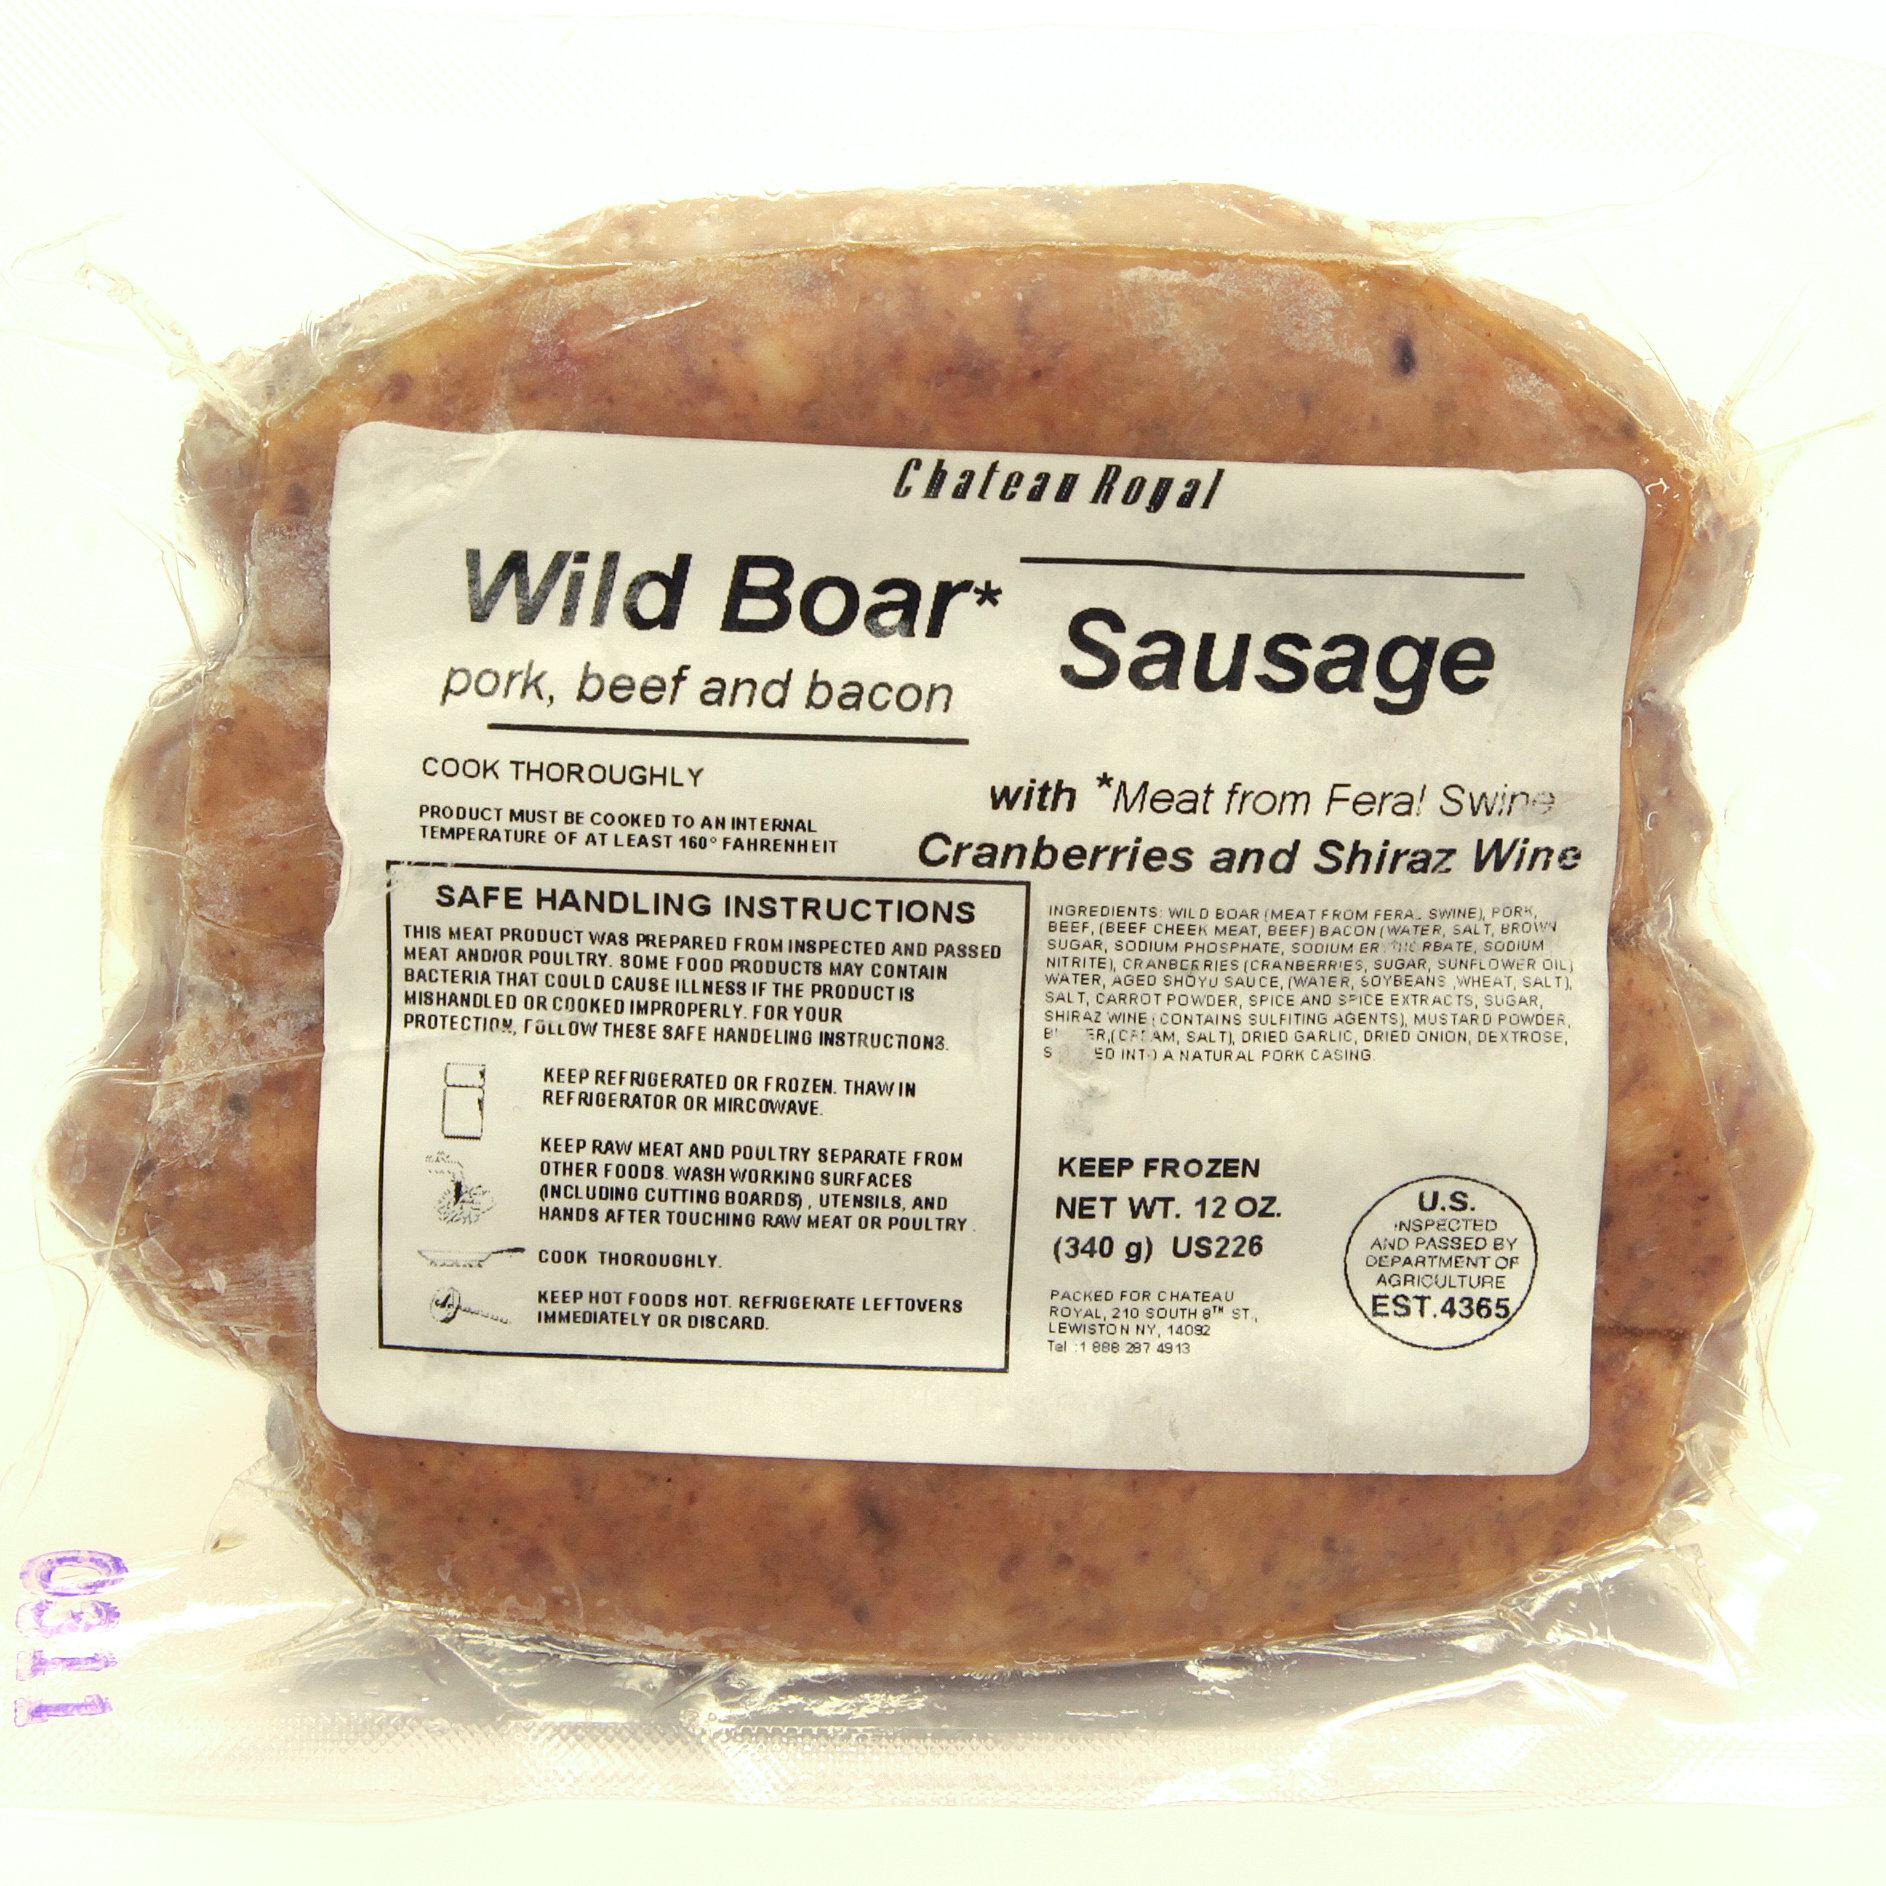 Chateau Royal, Wild Boar Sausage, 12 oz. 00048